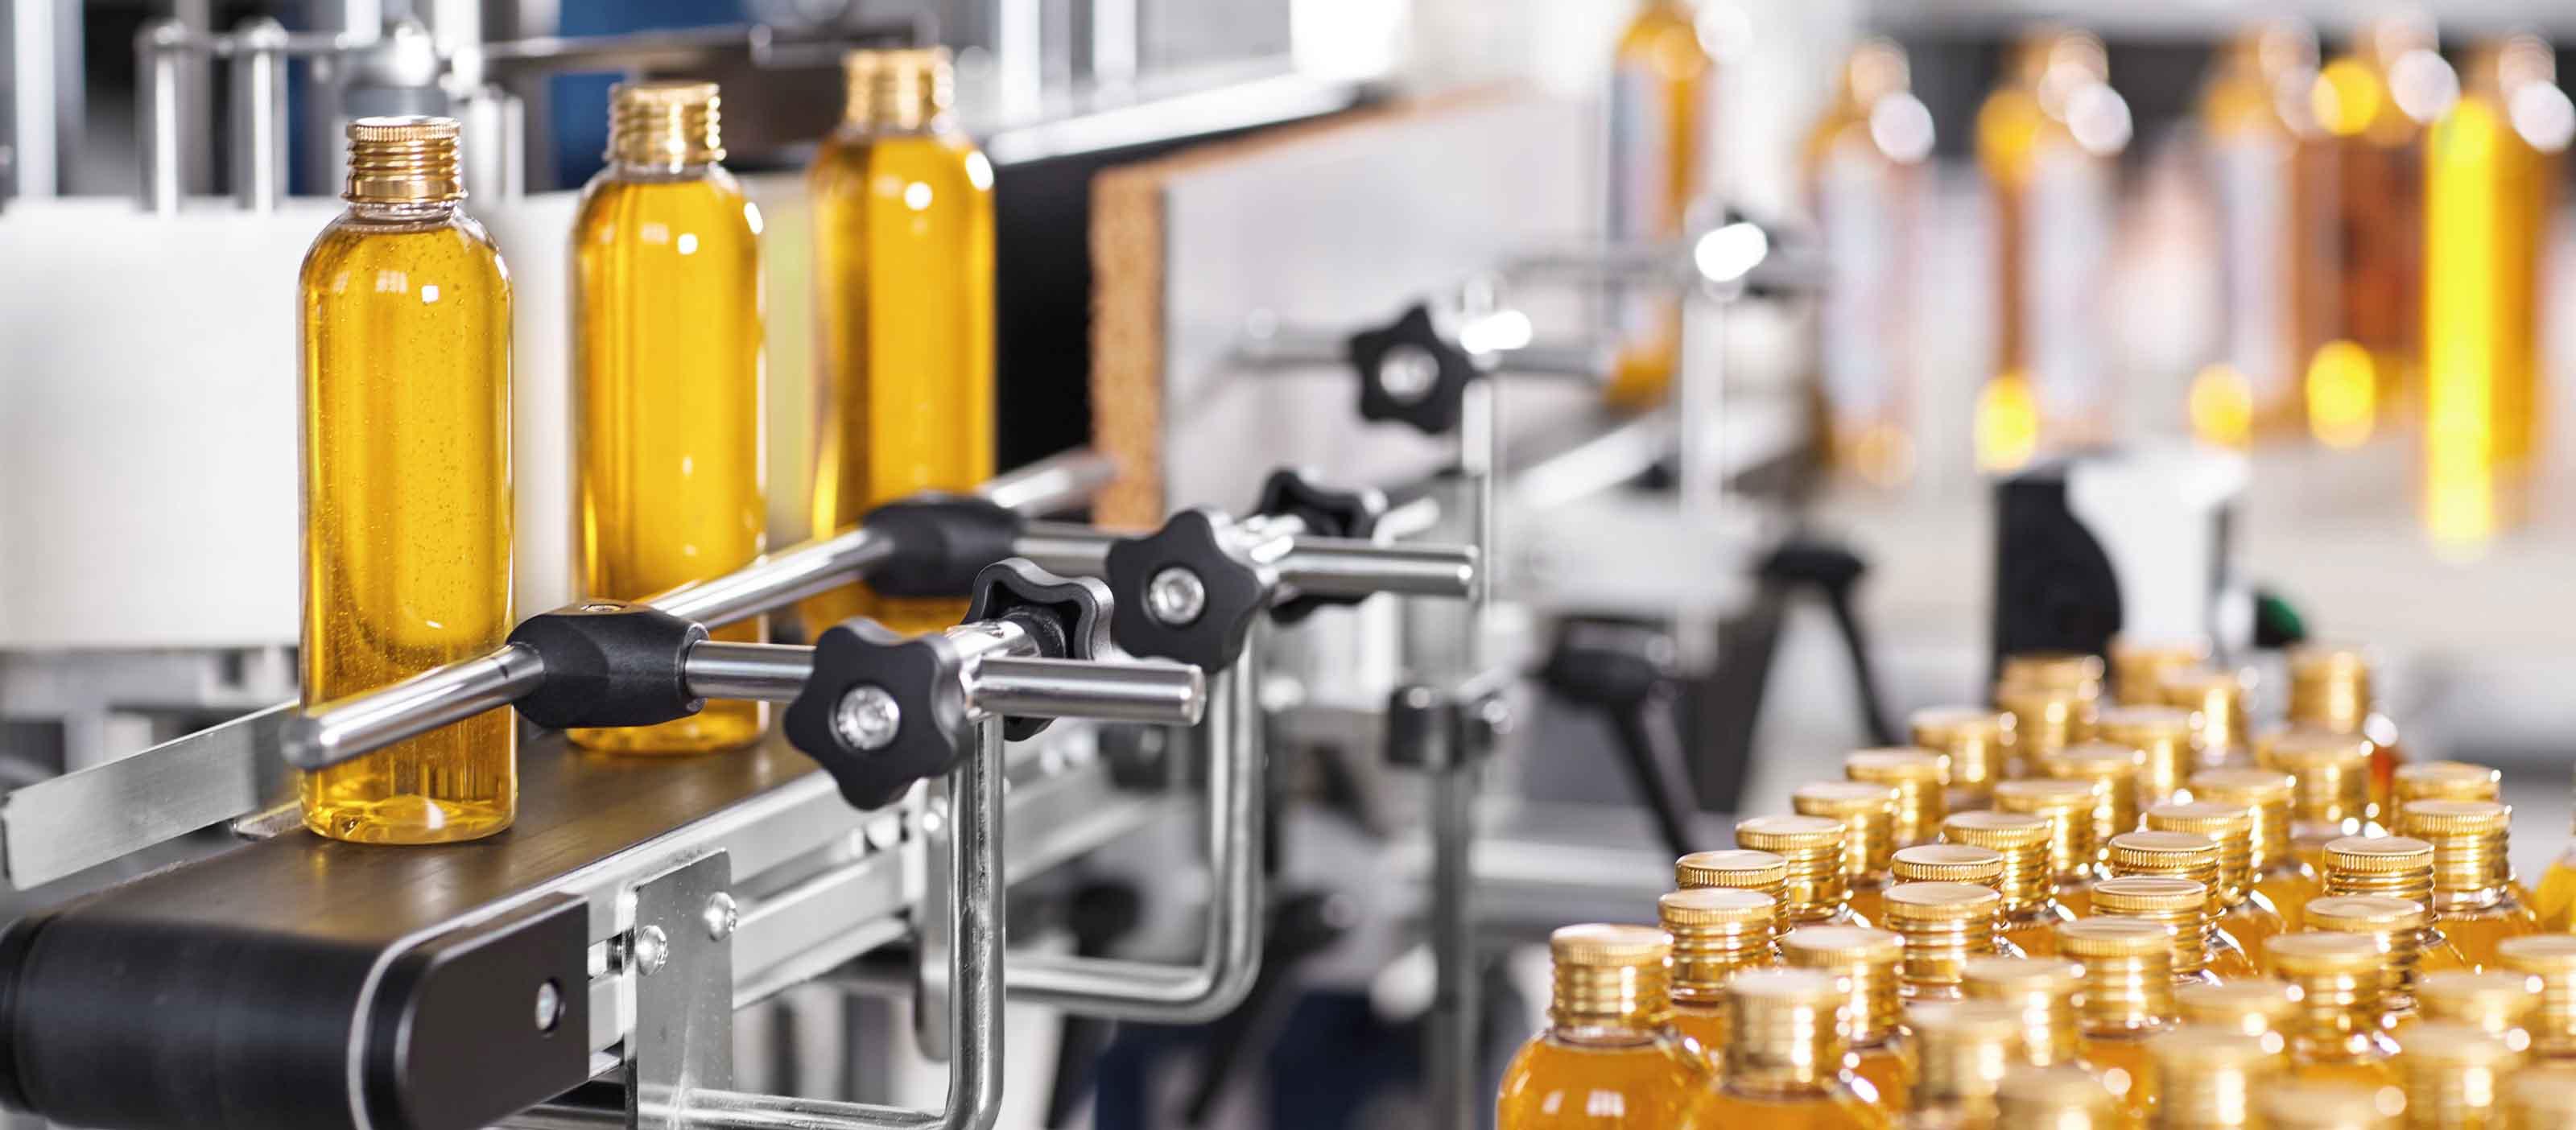 Cosmetic Manufacturing | GE Digital